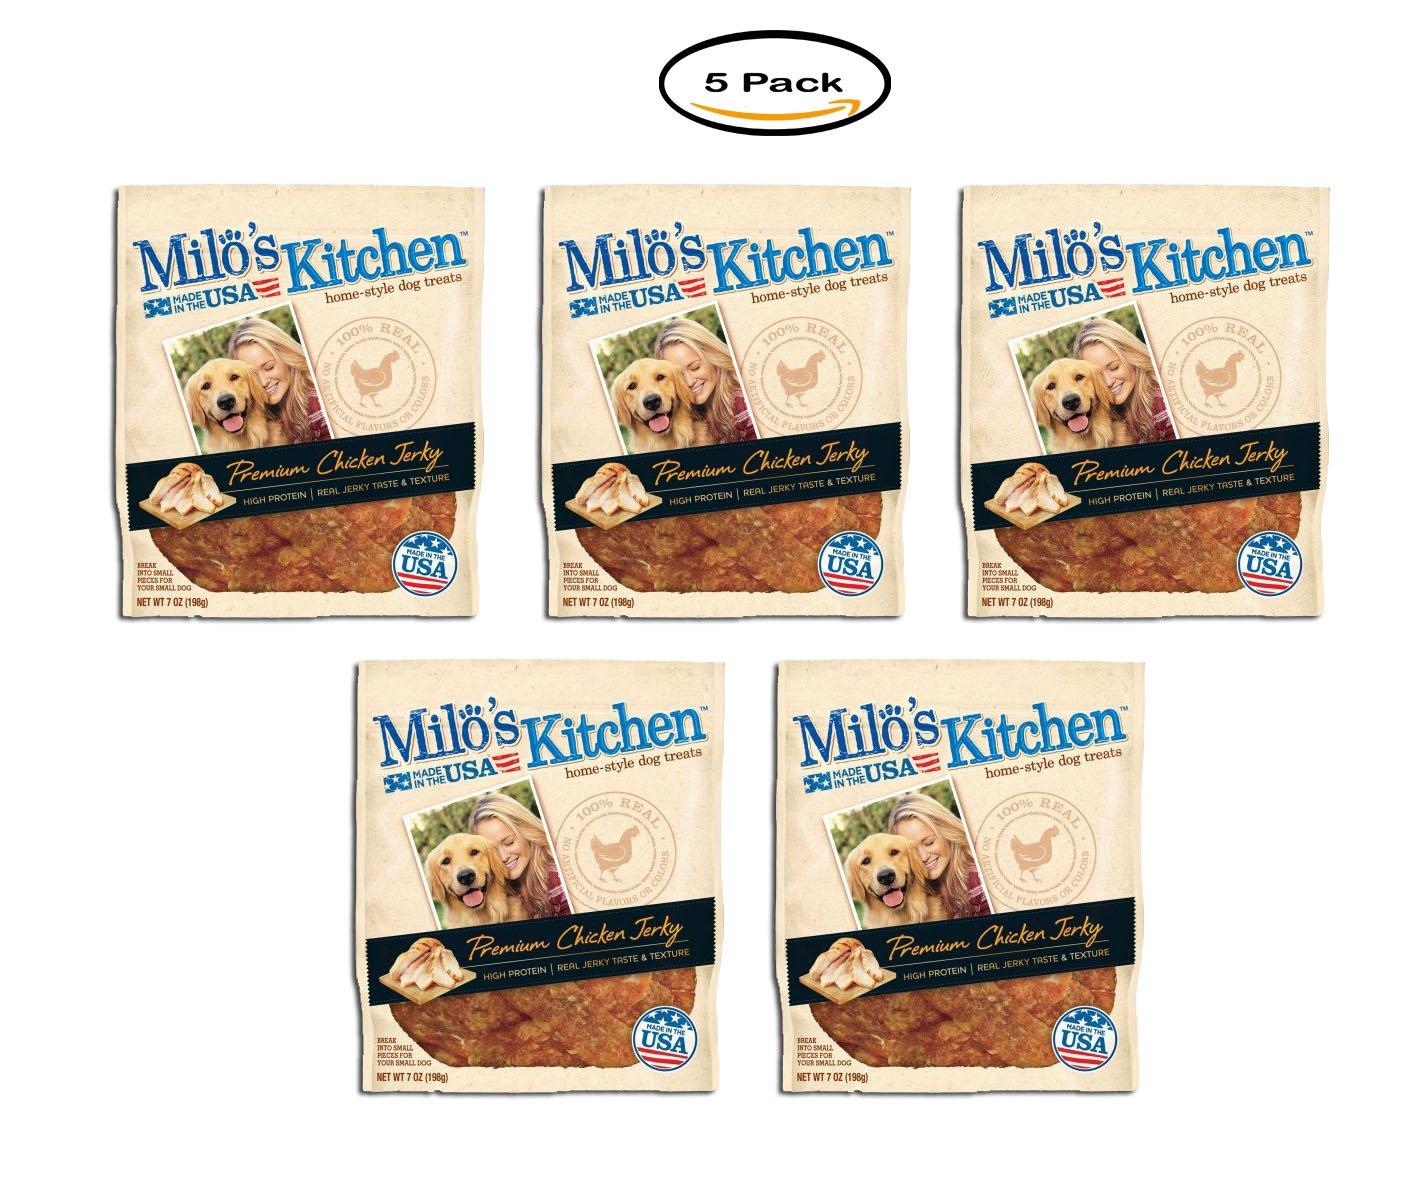 PACK OF 5 - Milo's Kitchen Premium Chicken Jerky Dry Dog Treats , 7 Oz